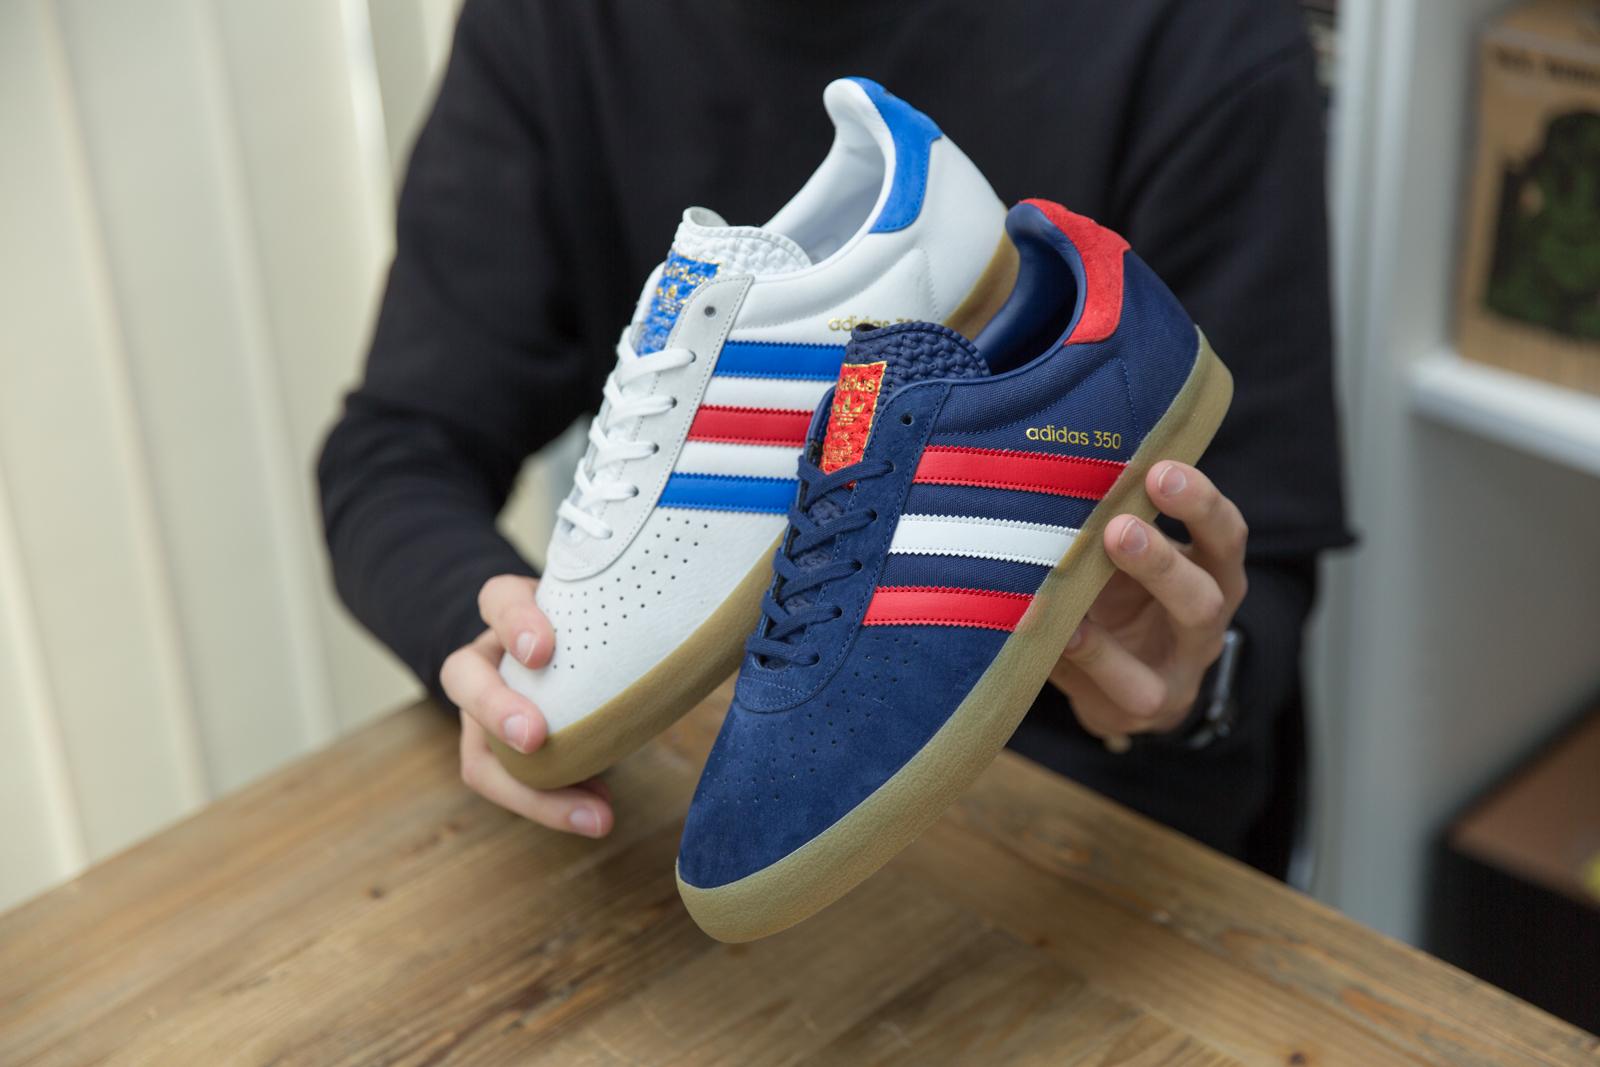 adidas Originals Archive 350 Suede – size? Exclusive size